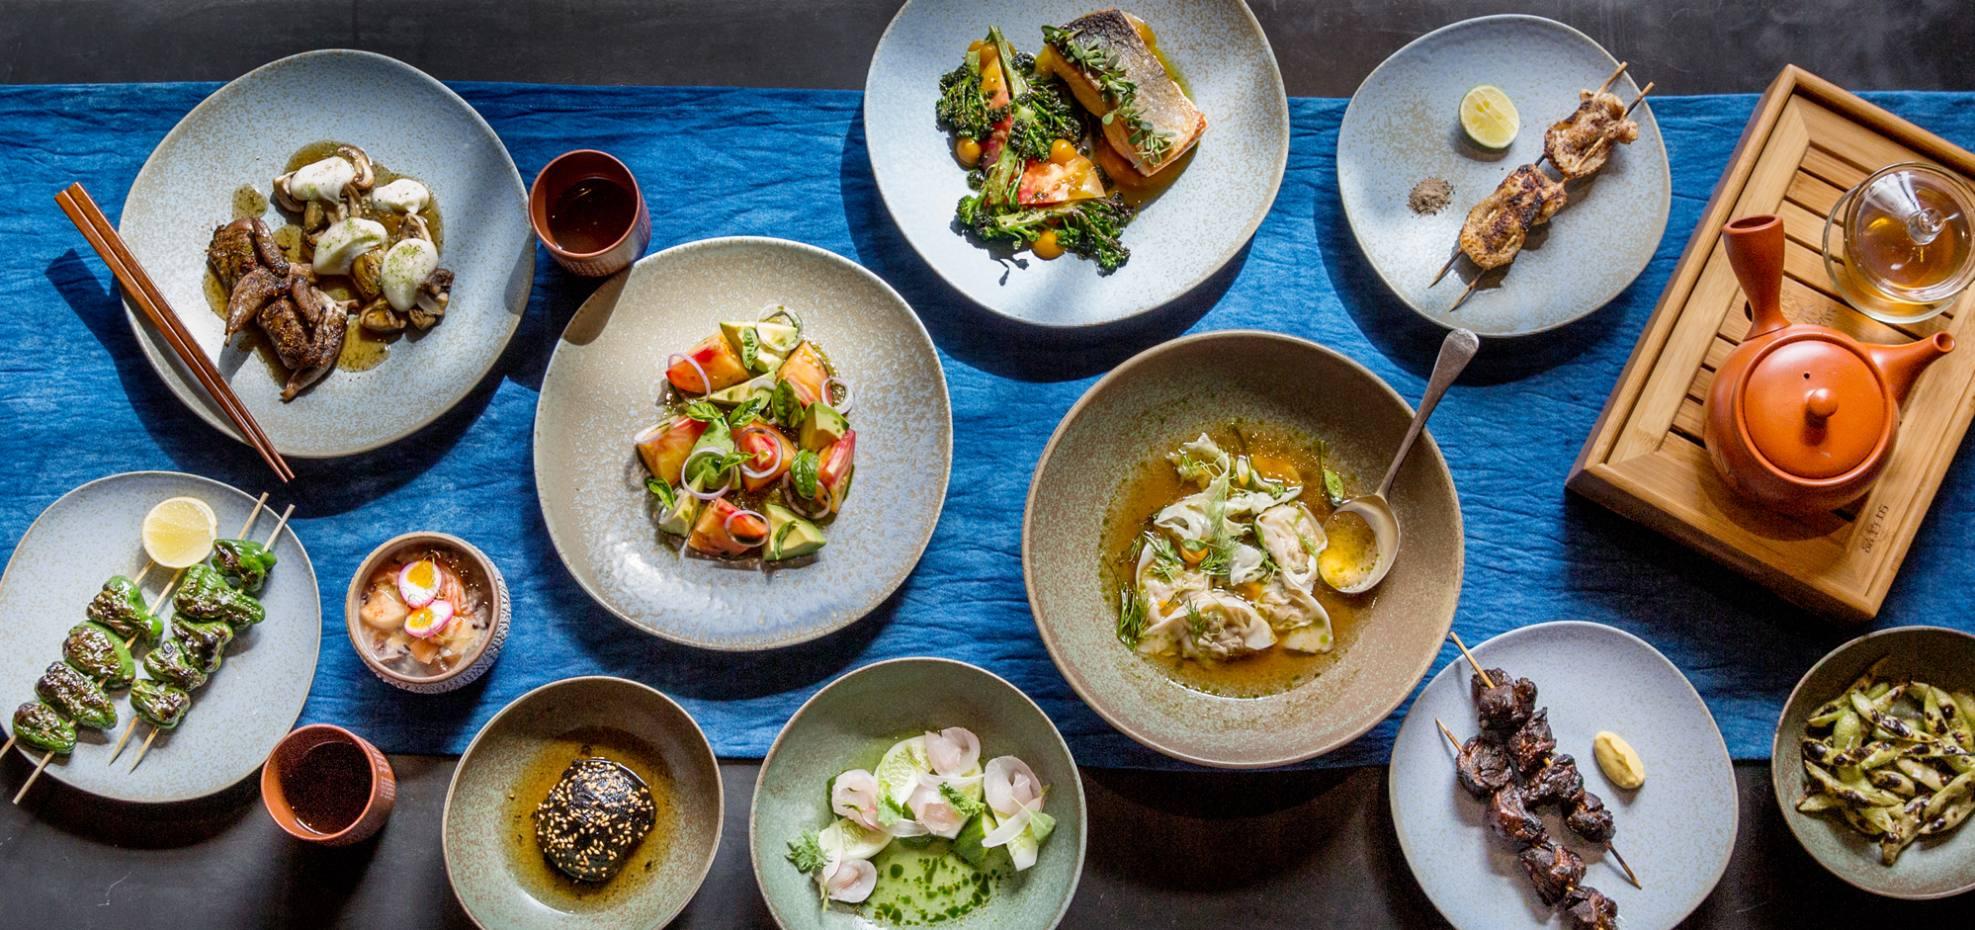 Food options include sharing plates of vegetarian bites, skewers of meat and dumplings